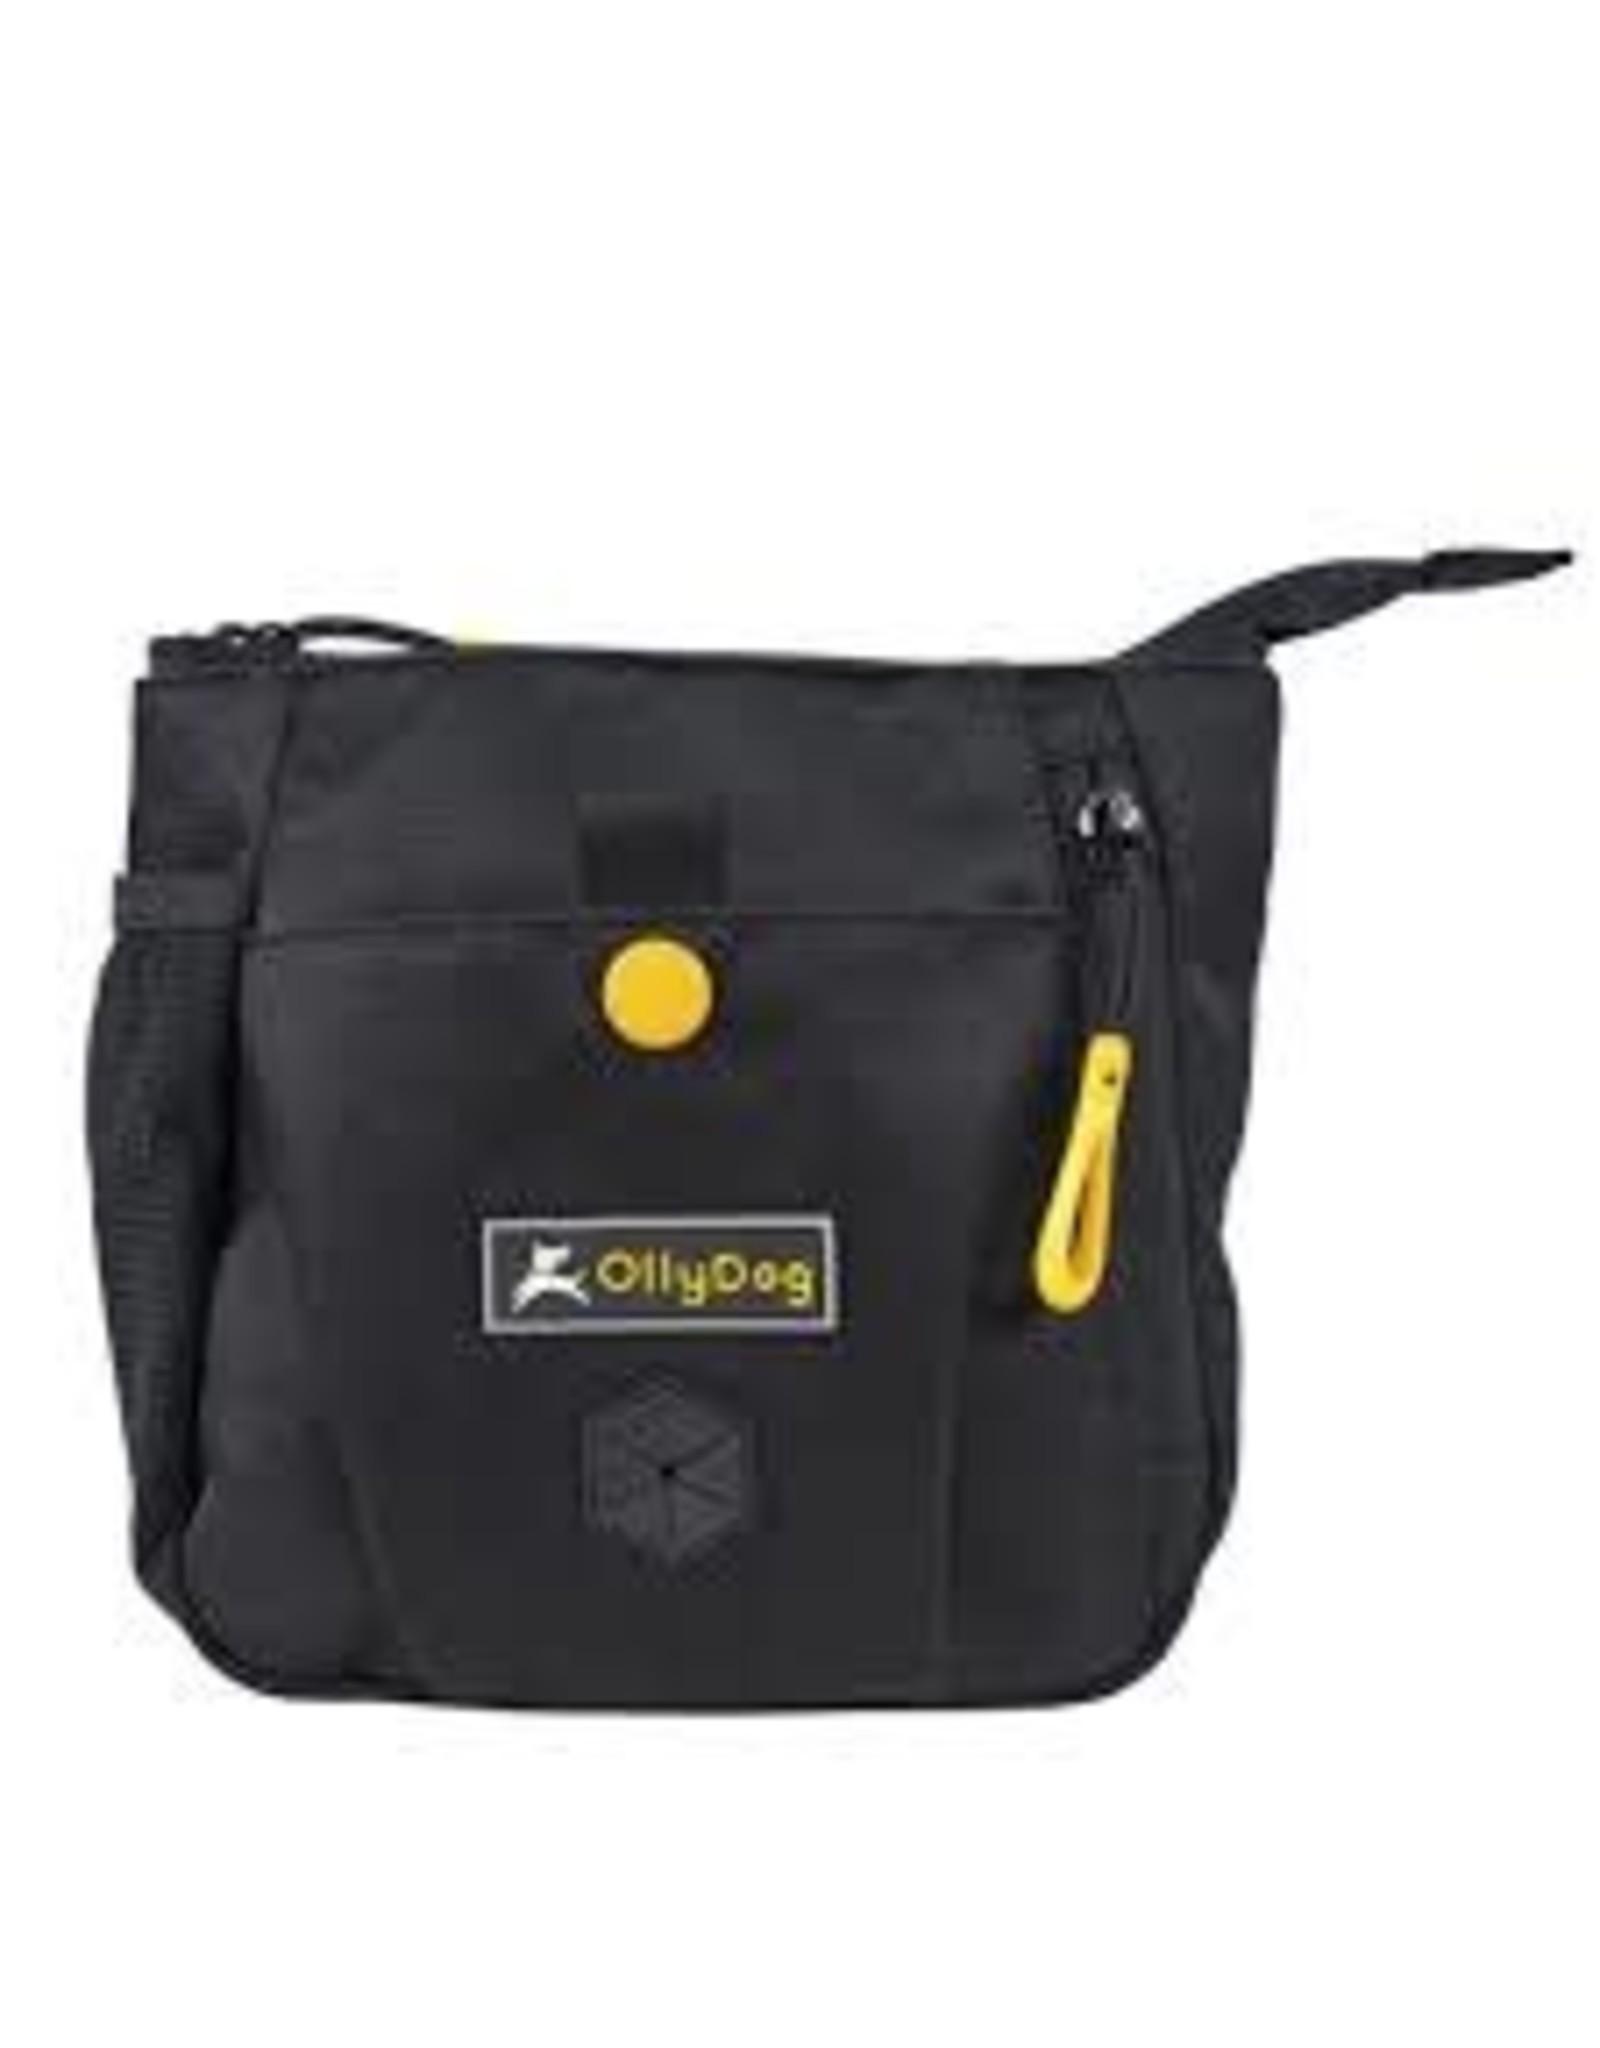 OllyDog OllyDog BackCountry Day Bag: Raven, os